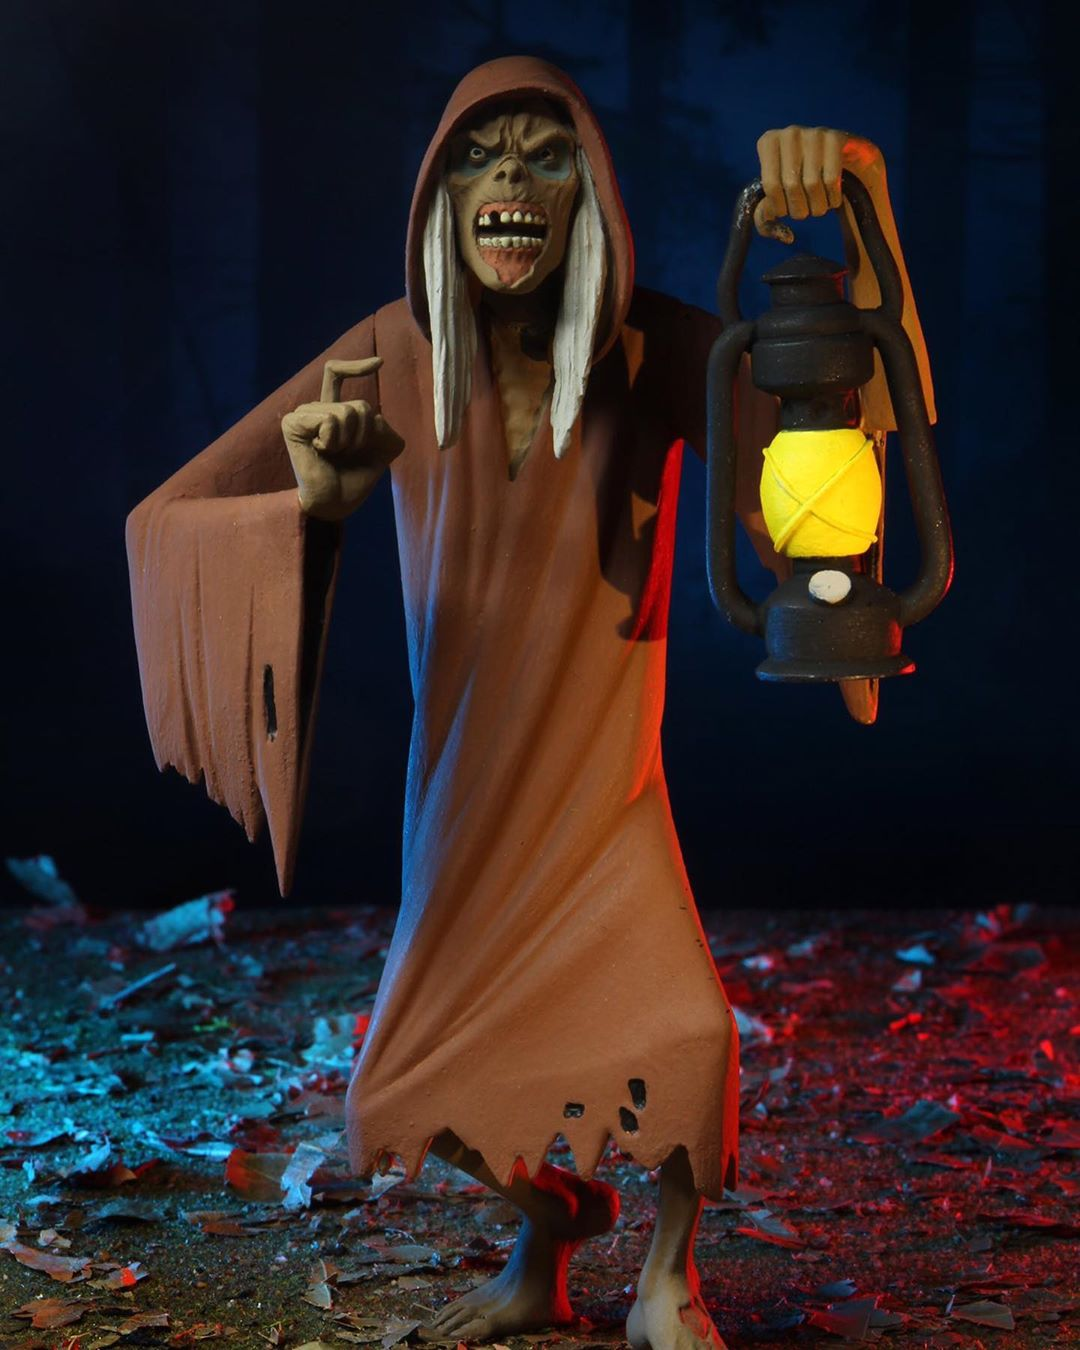 Creepshow Neca Figurine2